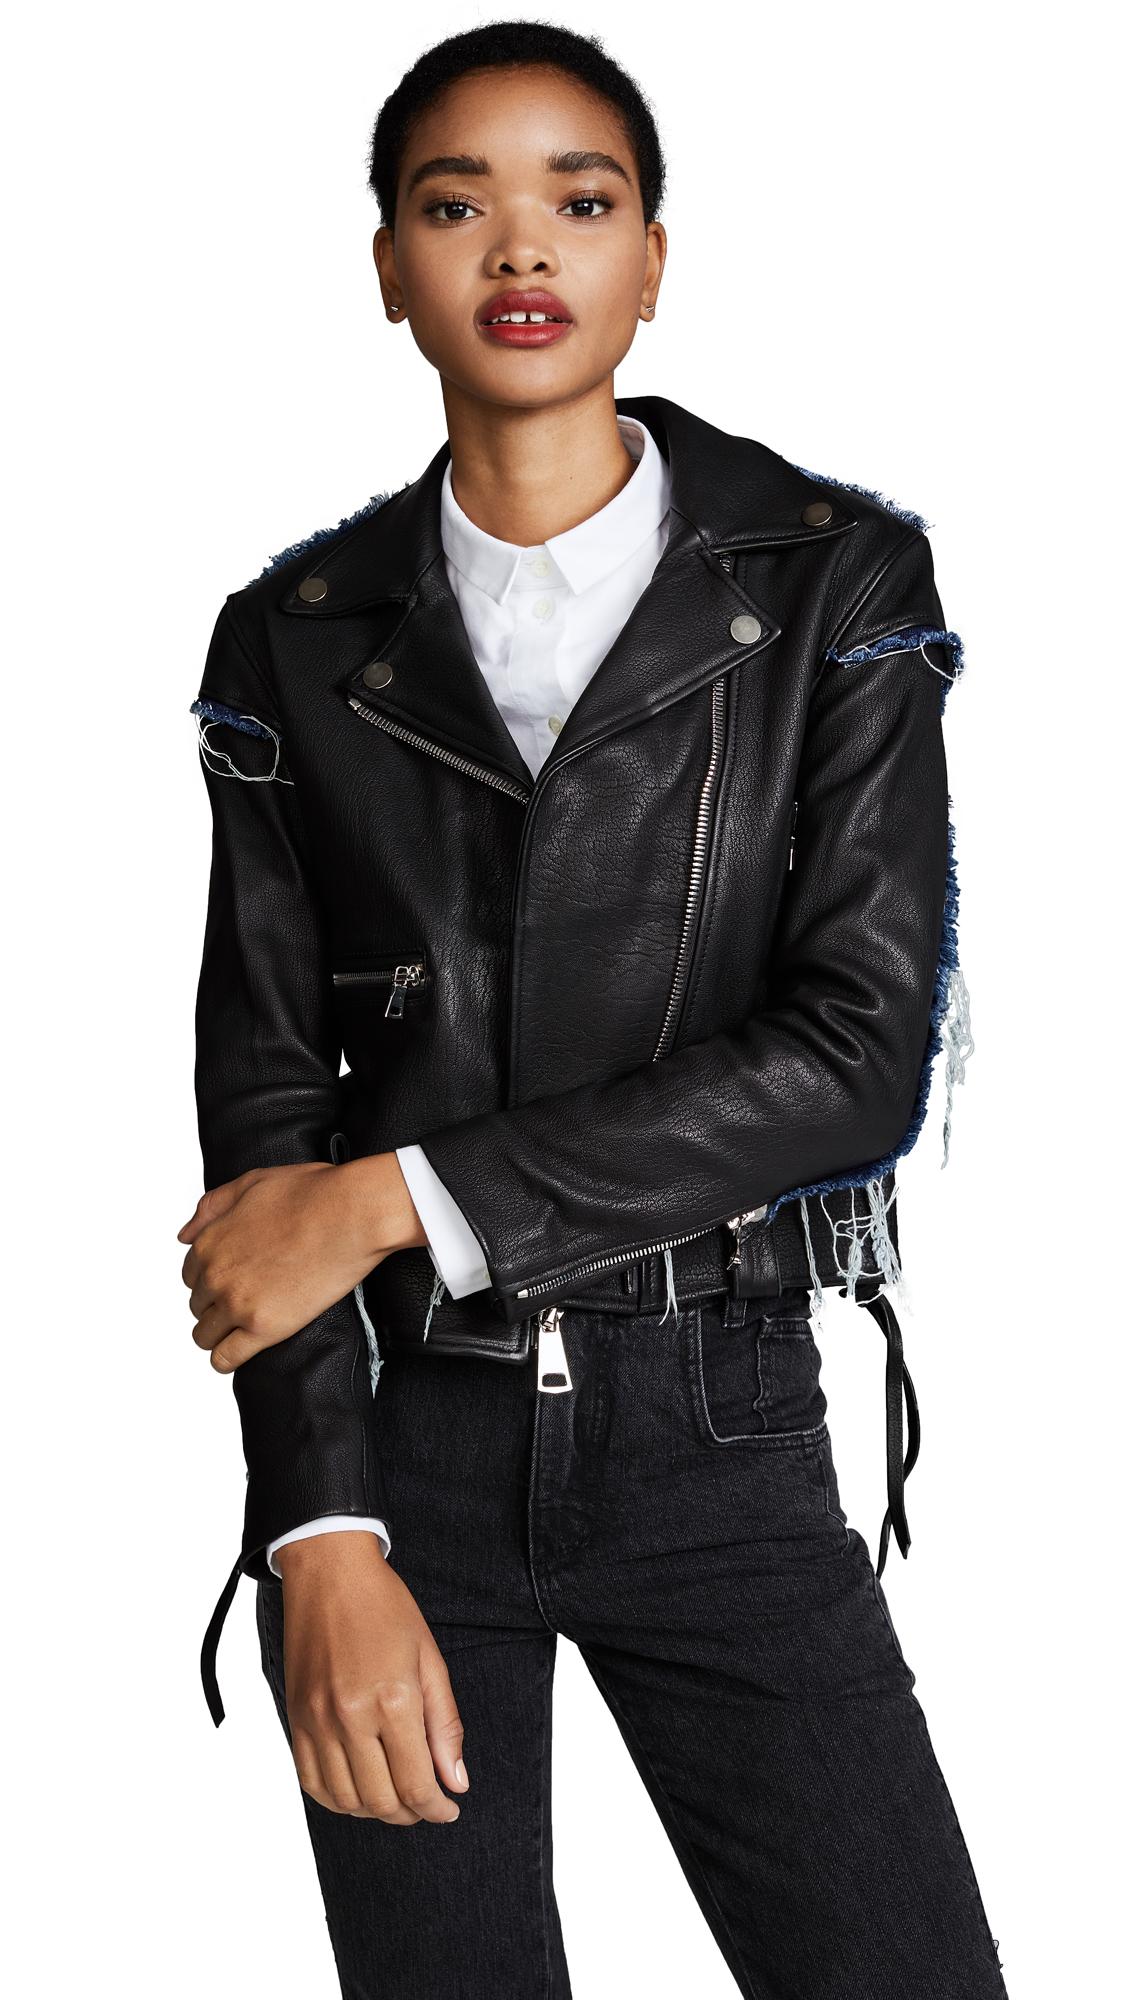 AMKIE The Denim Moto Jacket - Black